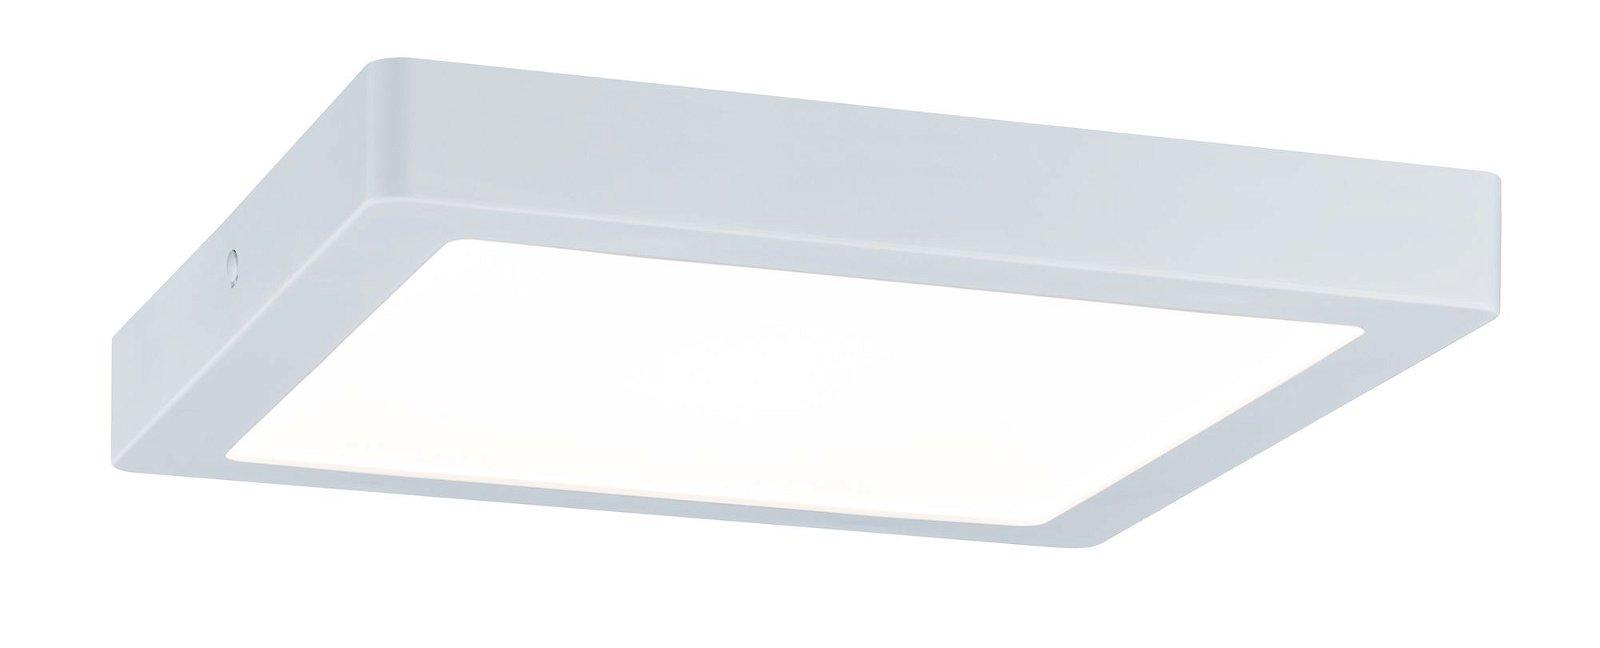 LED Panel Abia eckig 300x300mm 3200lm 2700K Weiß matt